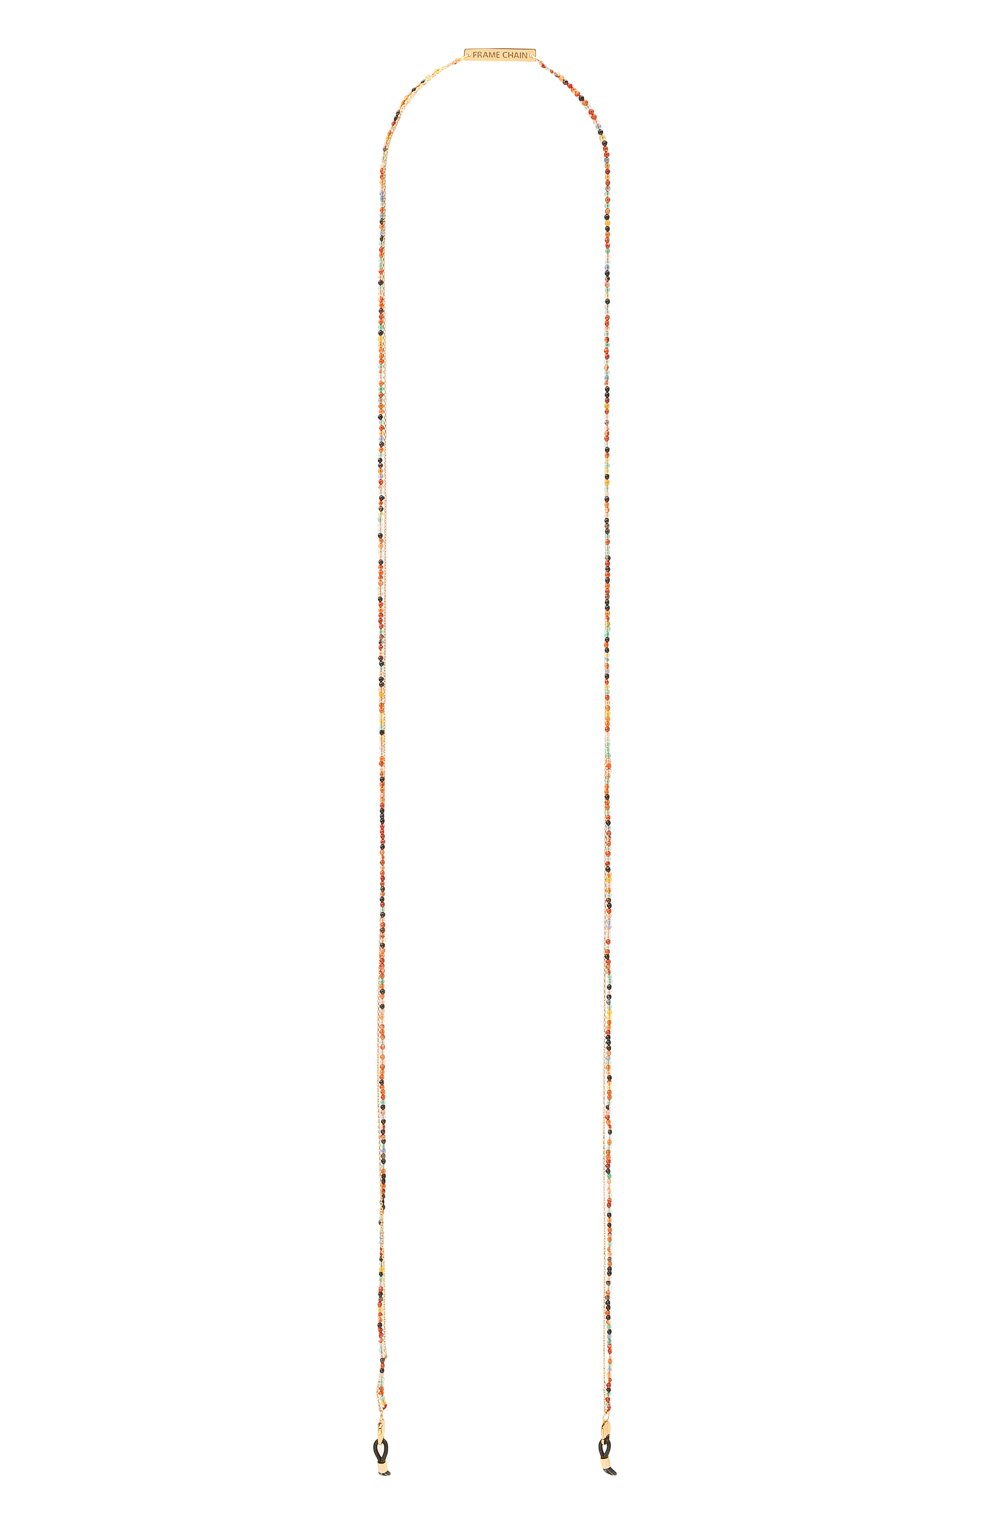 Женские цепочка для очков FRAME CHAIN разноцветного цвета, арт. IT`S A WRAP YELL0W G0LD   Фото 1 (Тип очков: Цепочка)